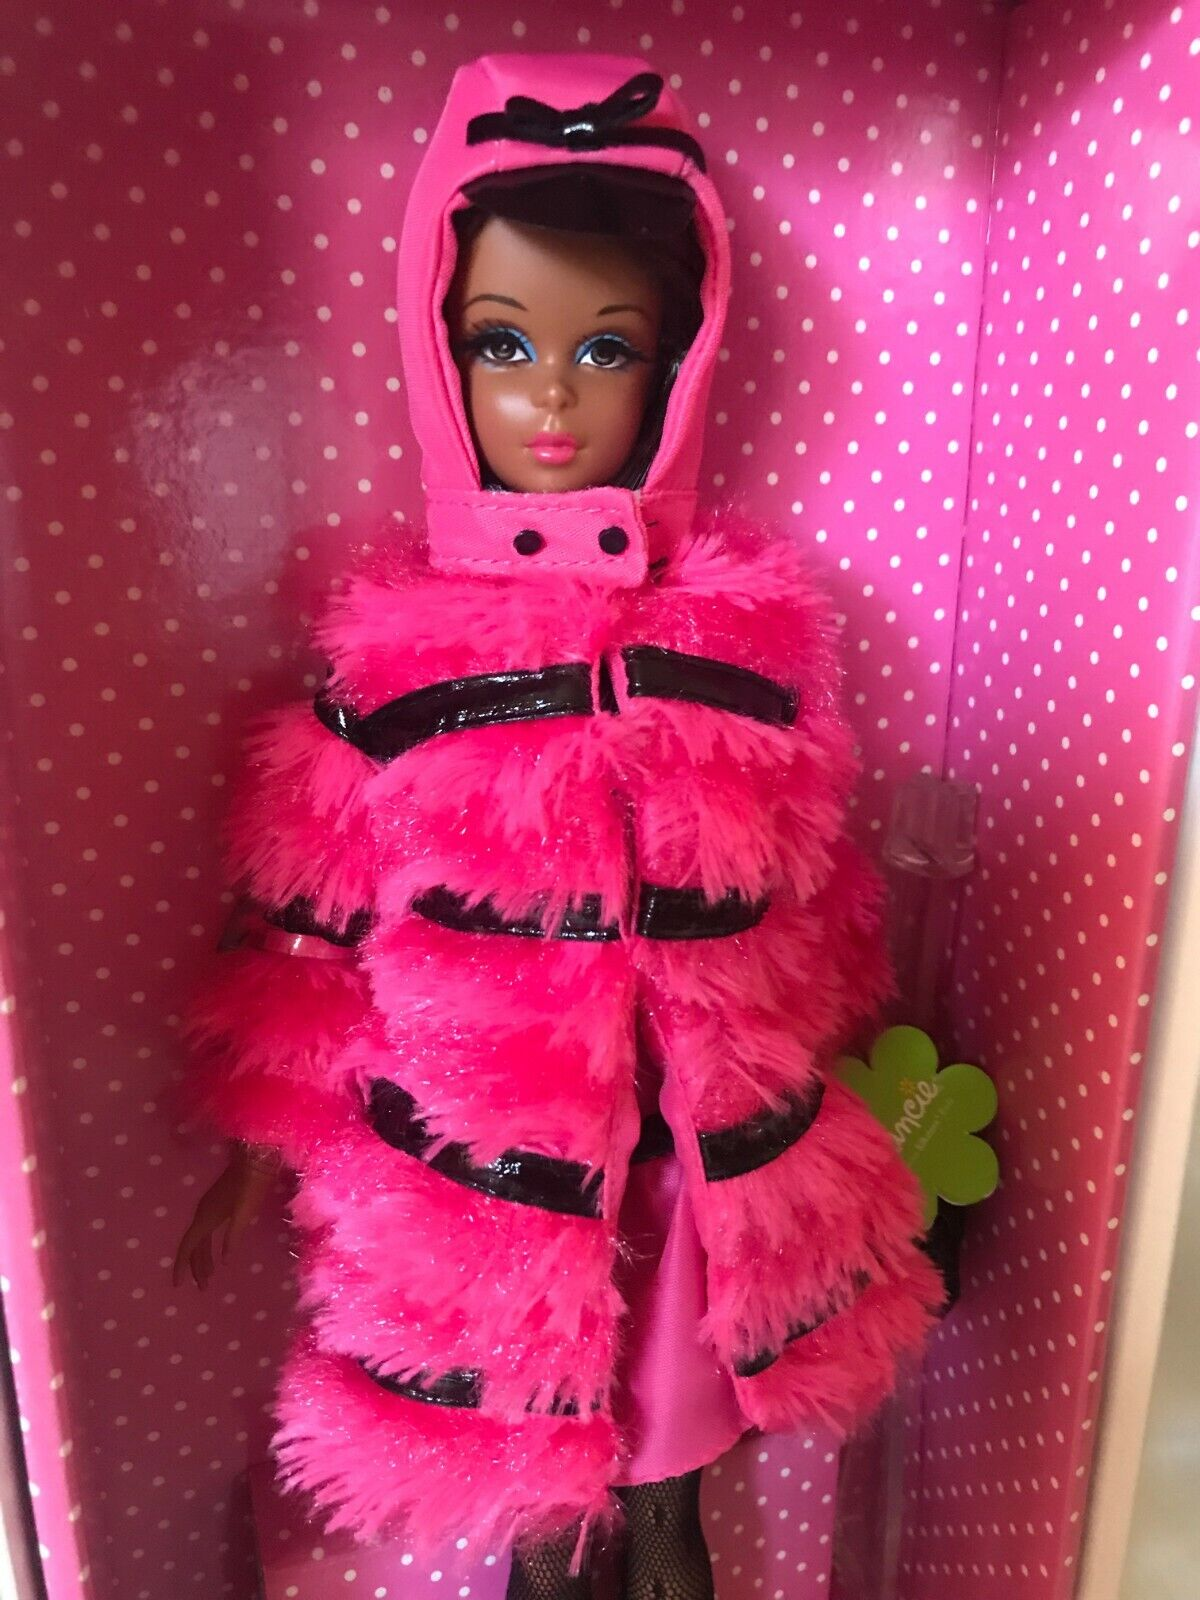 2012 Fuchsia 'n Fur  Francie Silkstone Barbie - NRFB - BFC Exclusive  sconto prezzo basso